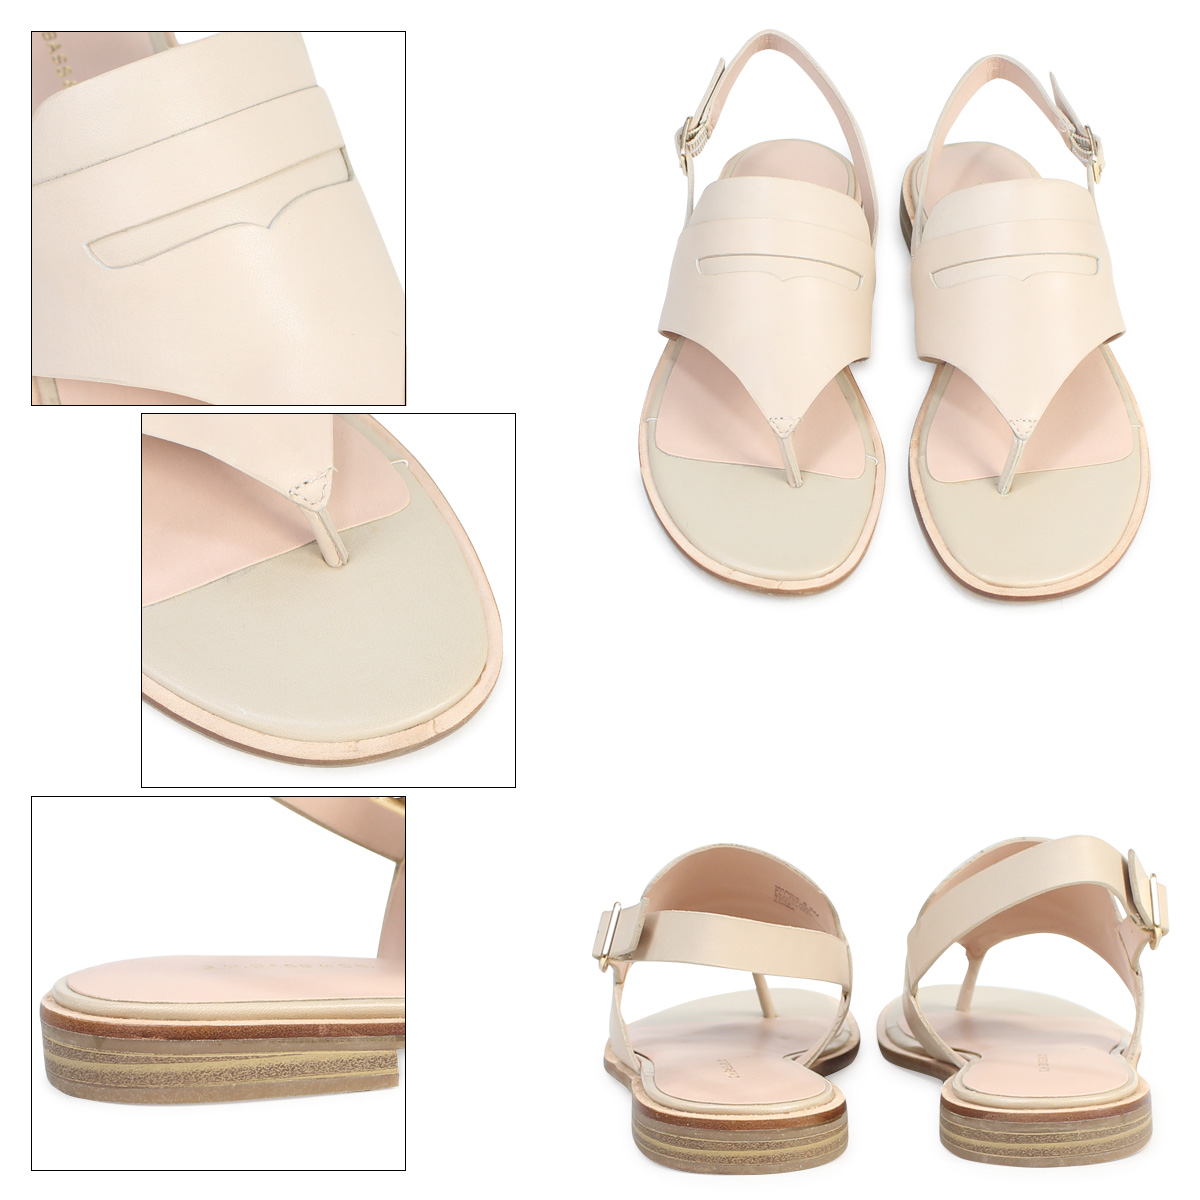 fd0ce79476a G H bus sandals Lady's G.H. BASS tong ankle strap MADDIE THONG SANDAL  71-20,330 shoe polish [177]